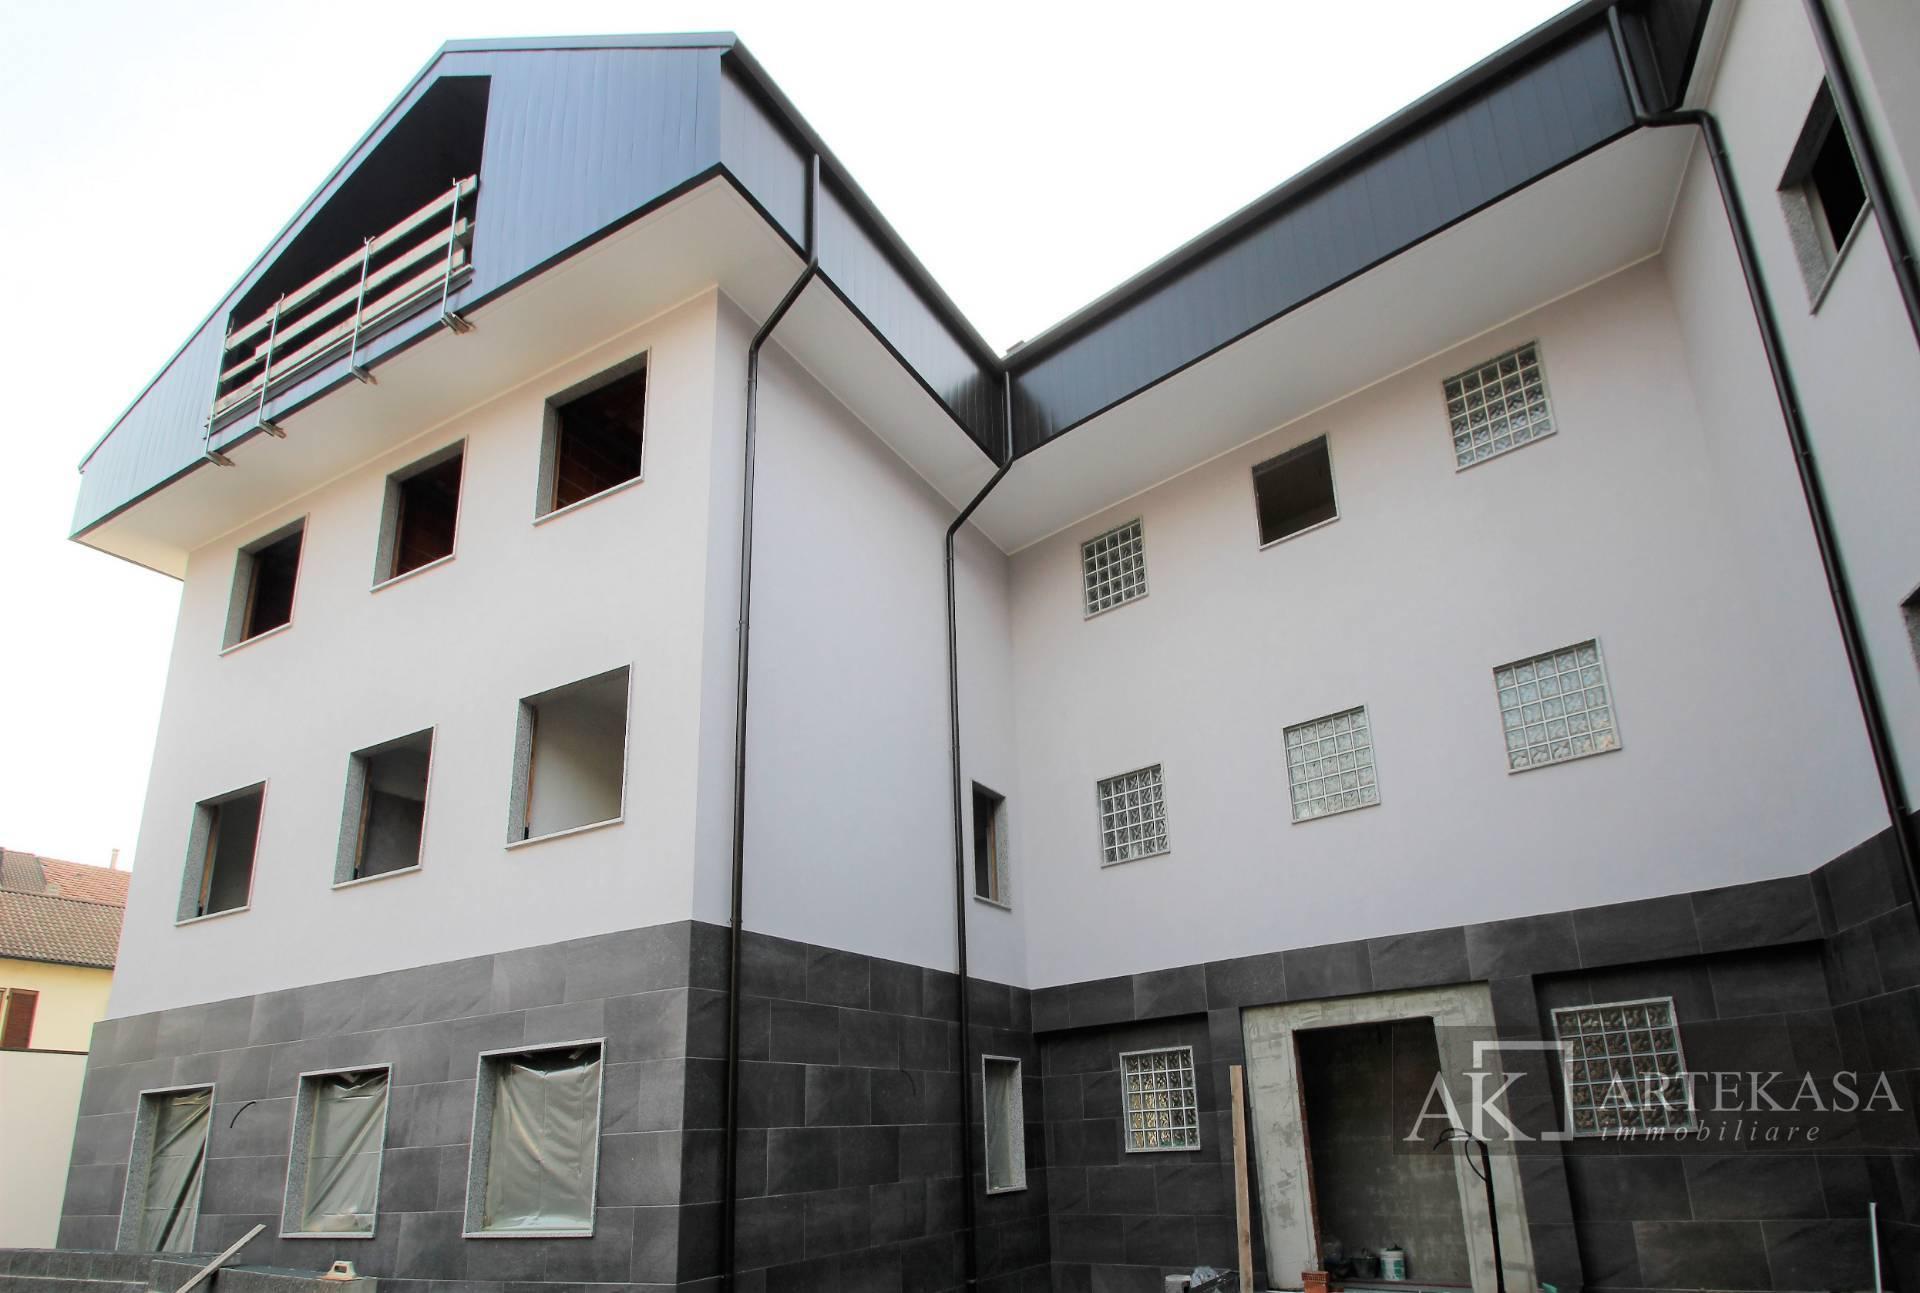 Attico Novara - San Martino